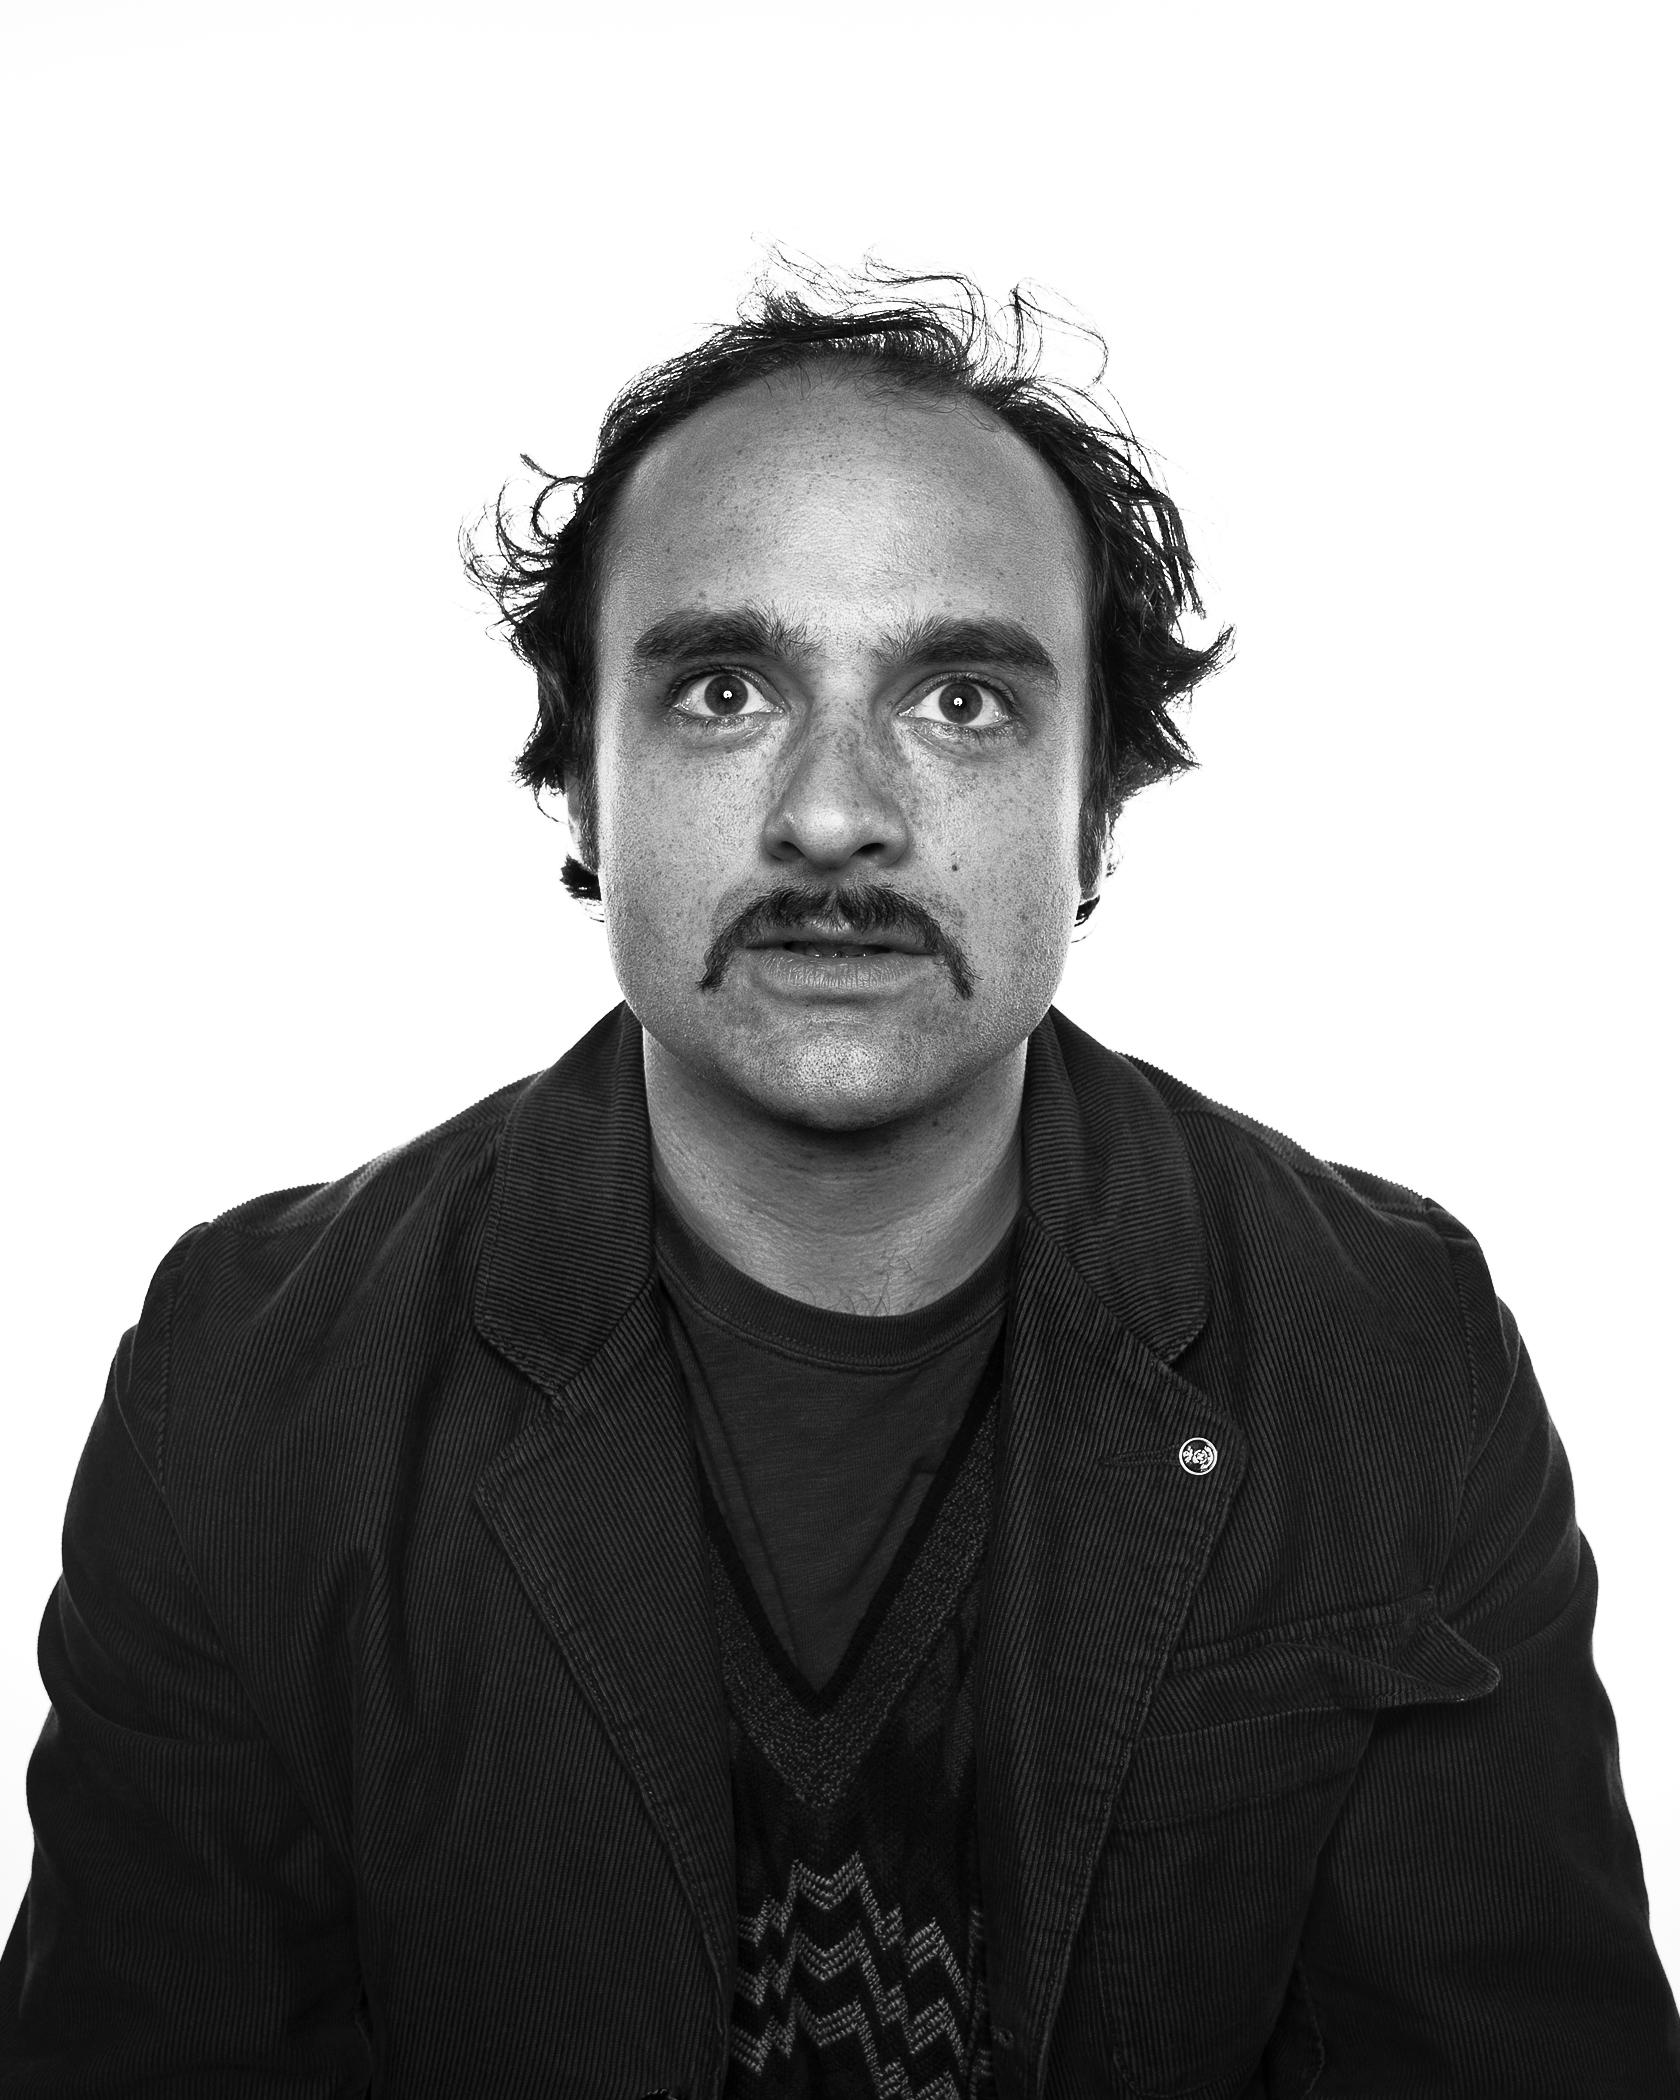 Movember Portraits